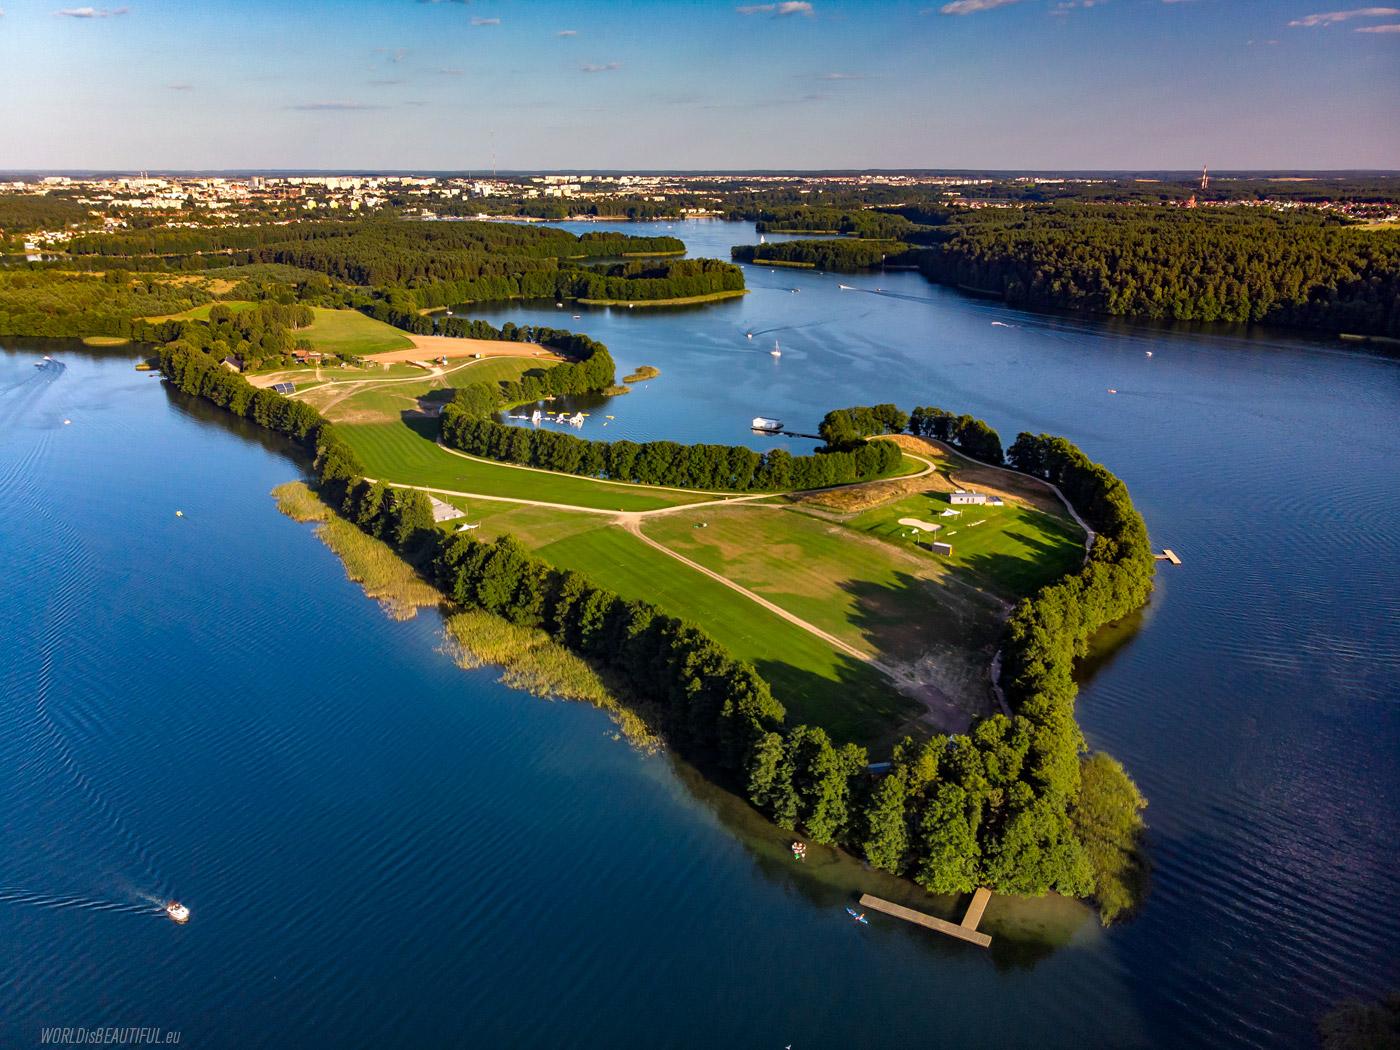 Jezioro Ukiel i miasto na horyzoncie